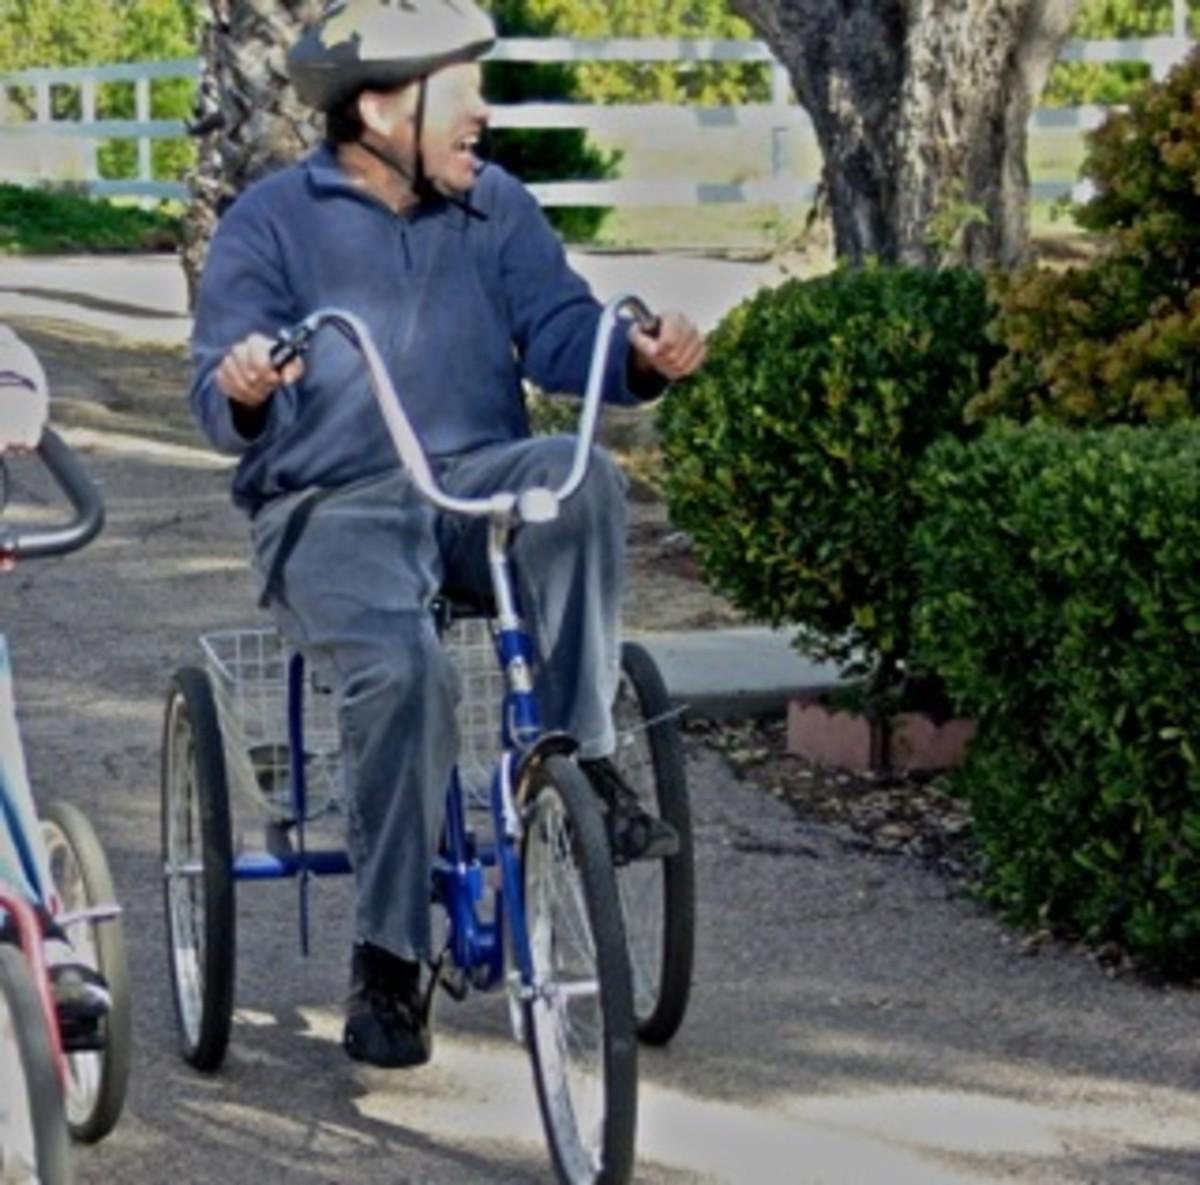 Enjoying Mobiling on a 3-wheel cycle